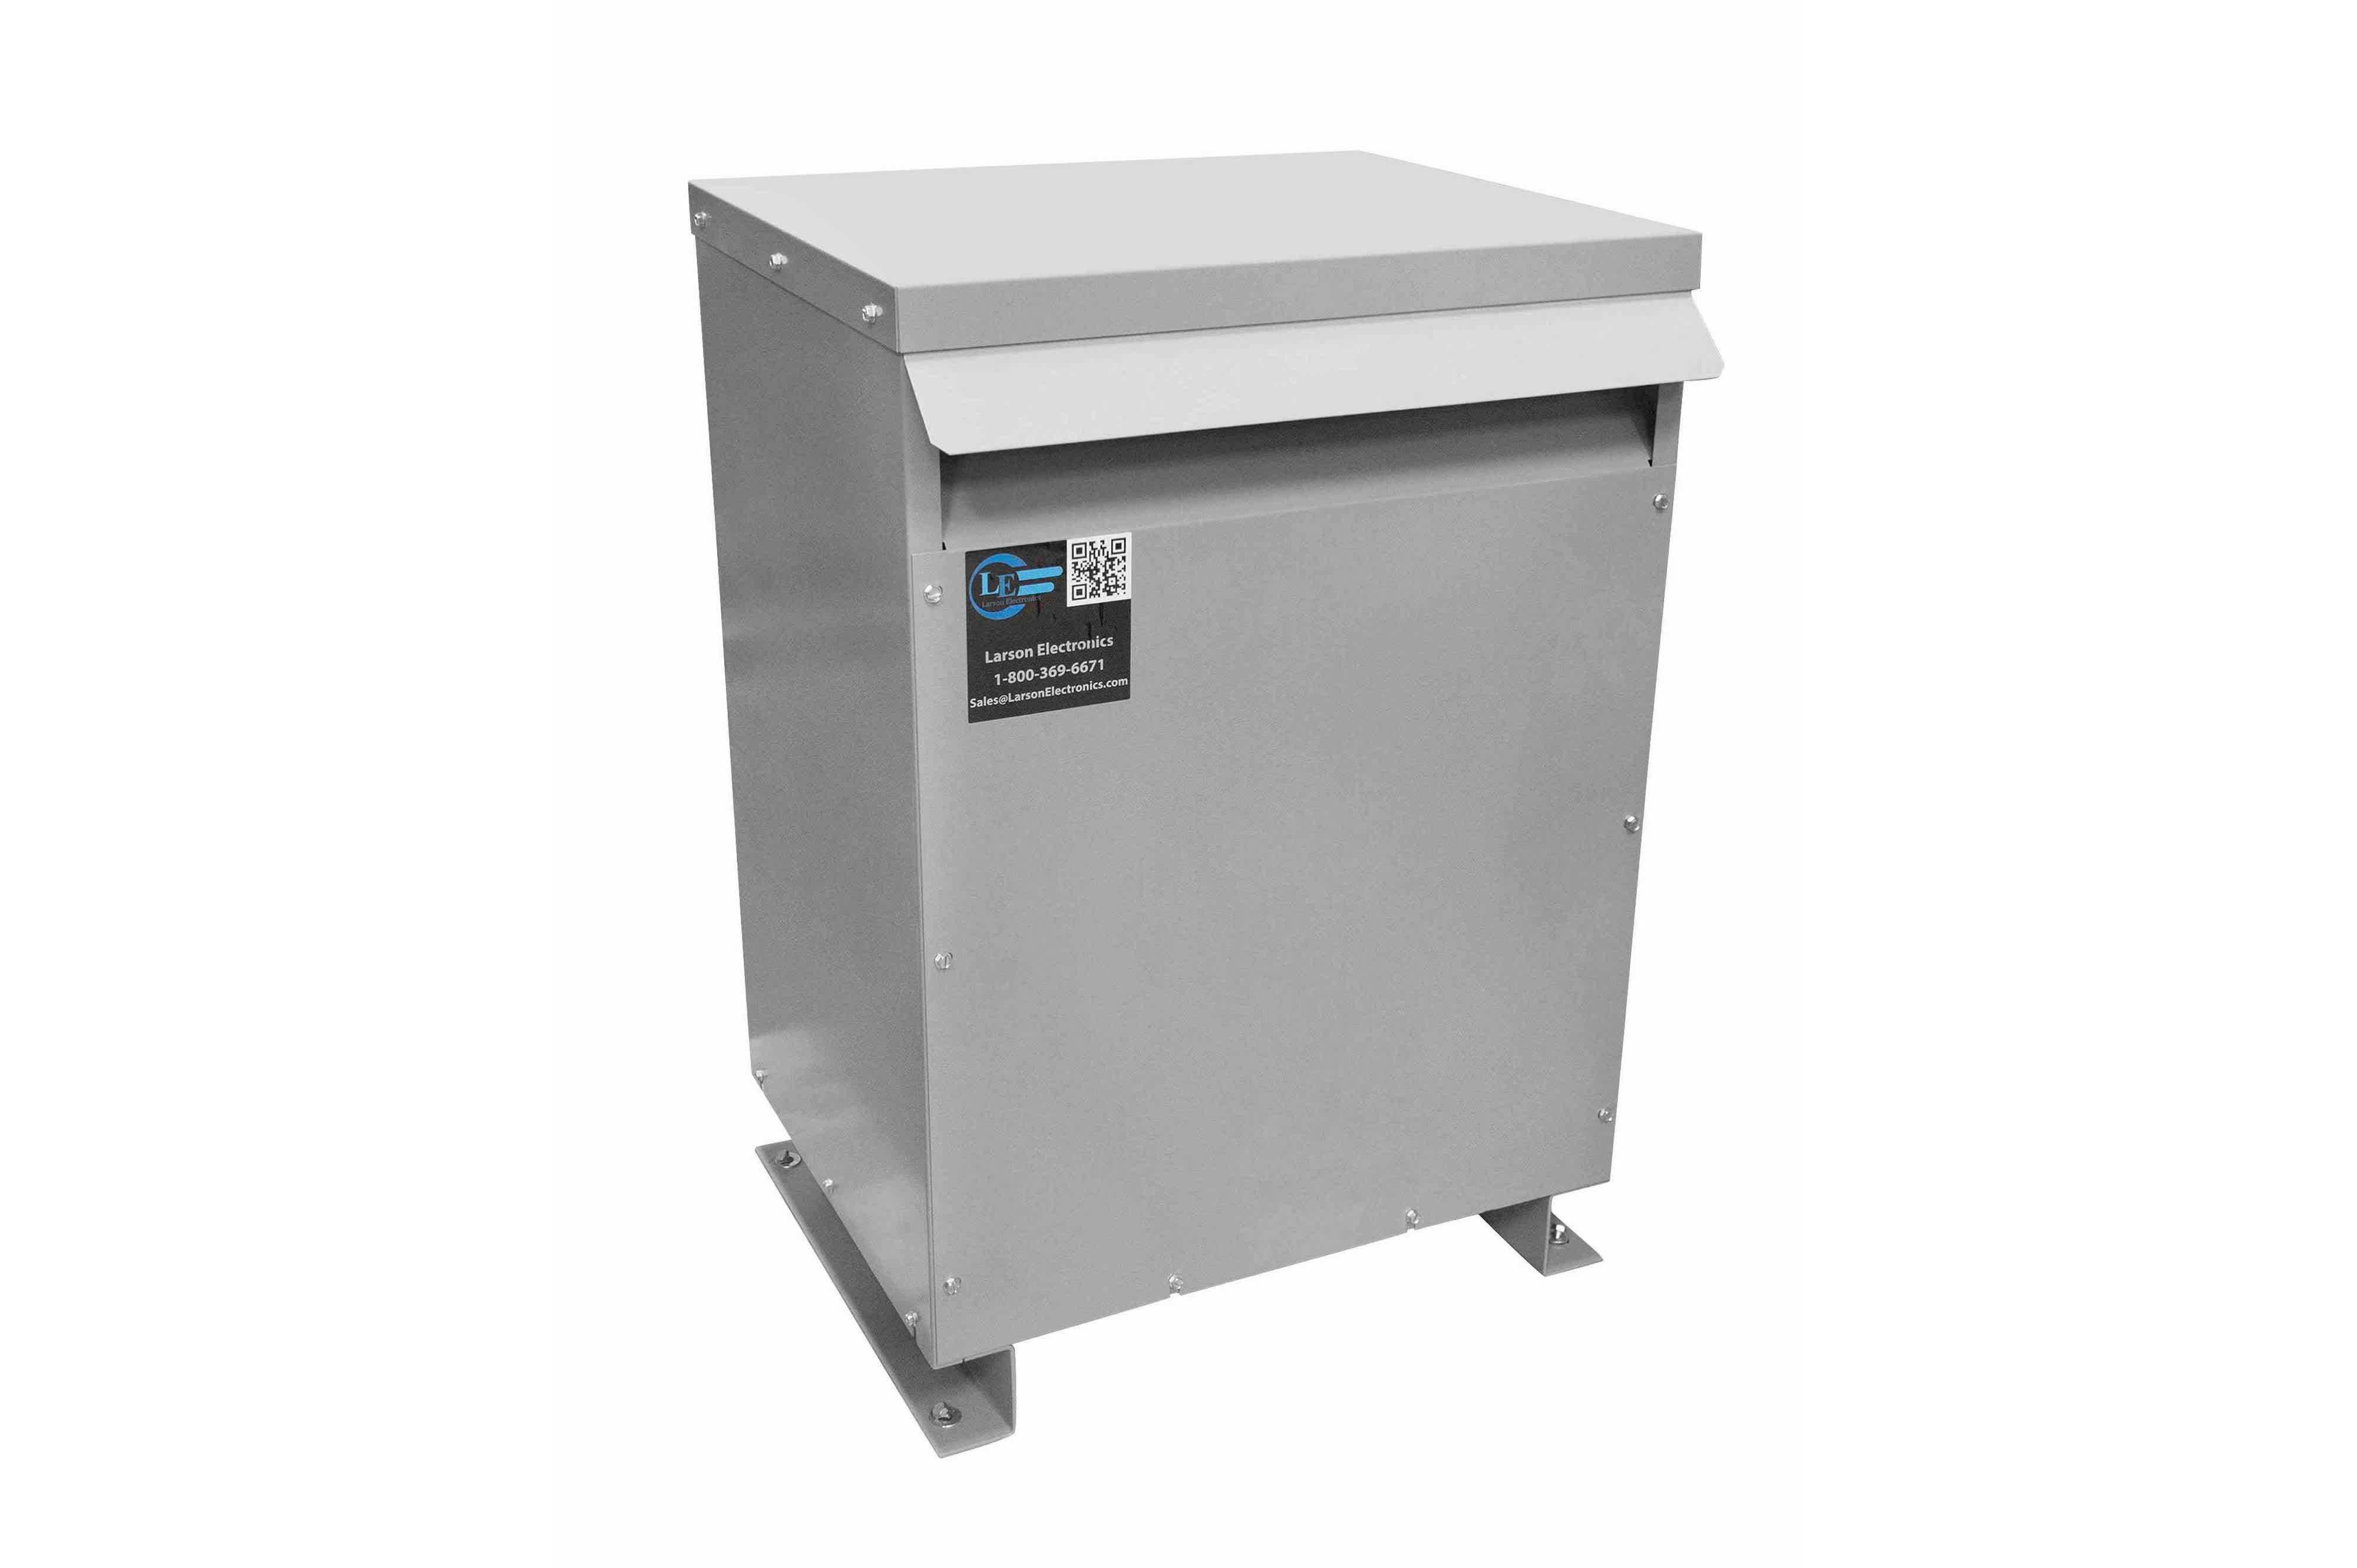 22.5 kVA 3PH Isolation Transformer, 208V Wye Primary, 400V Delta Secondary, N3R, Ventilated, 60 Hz